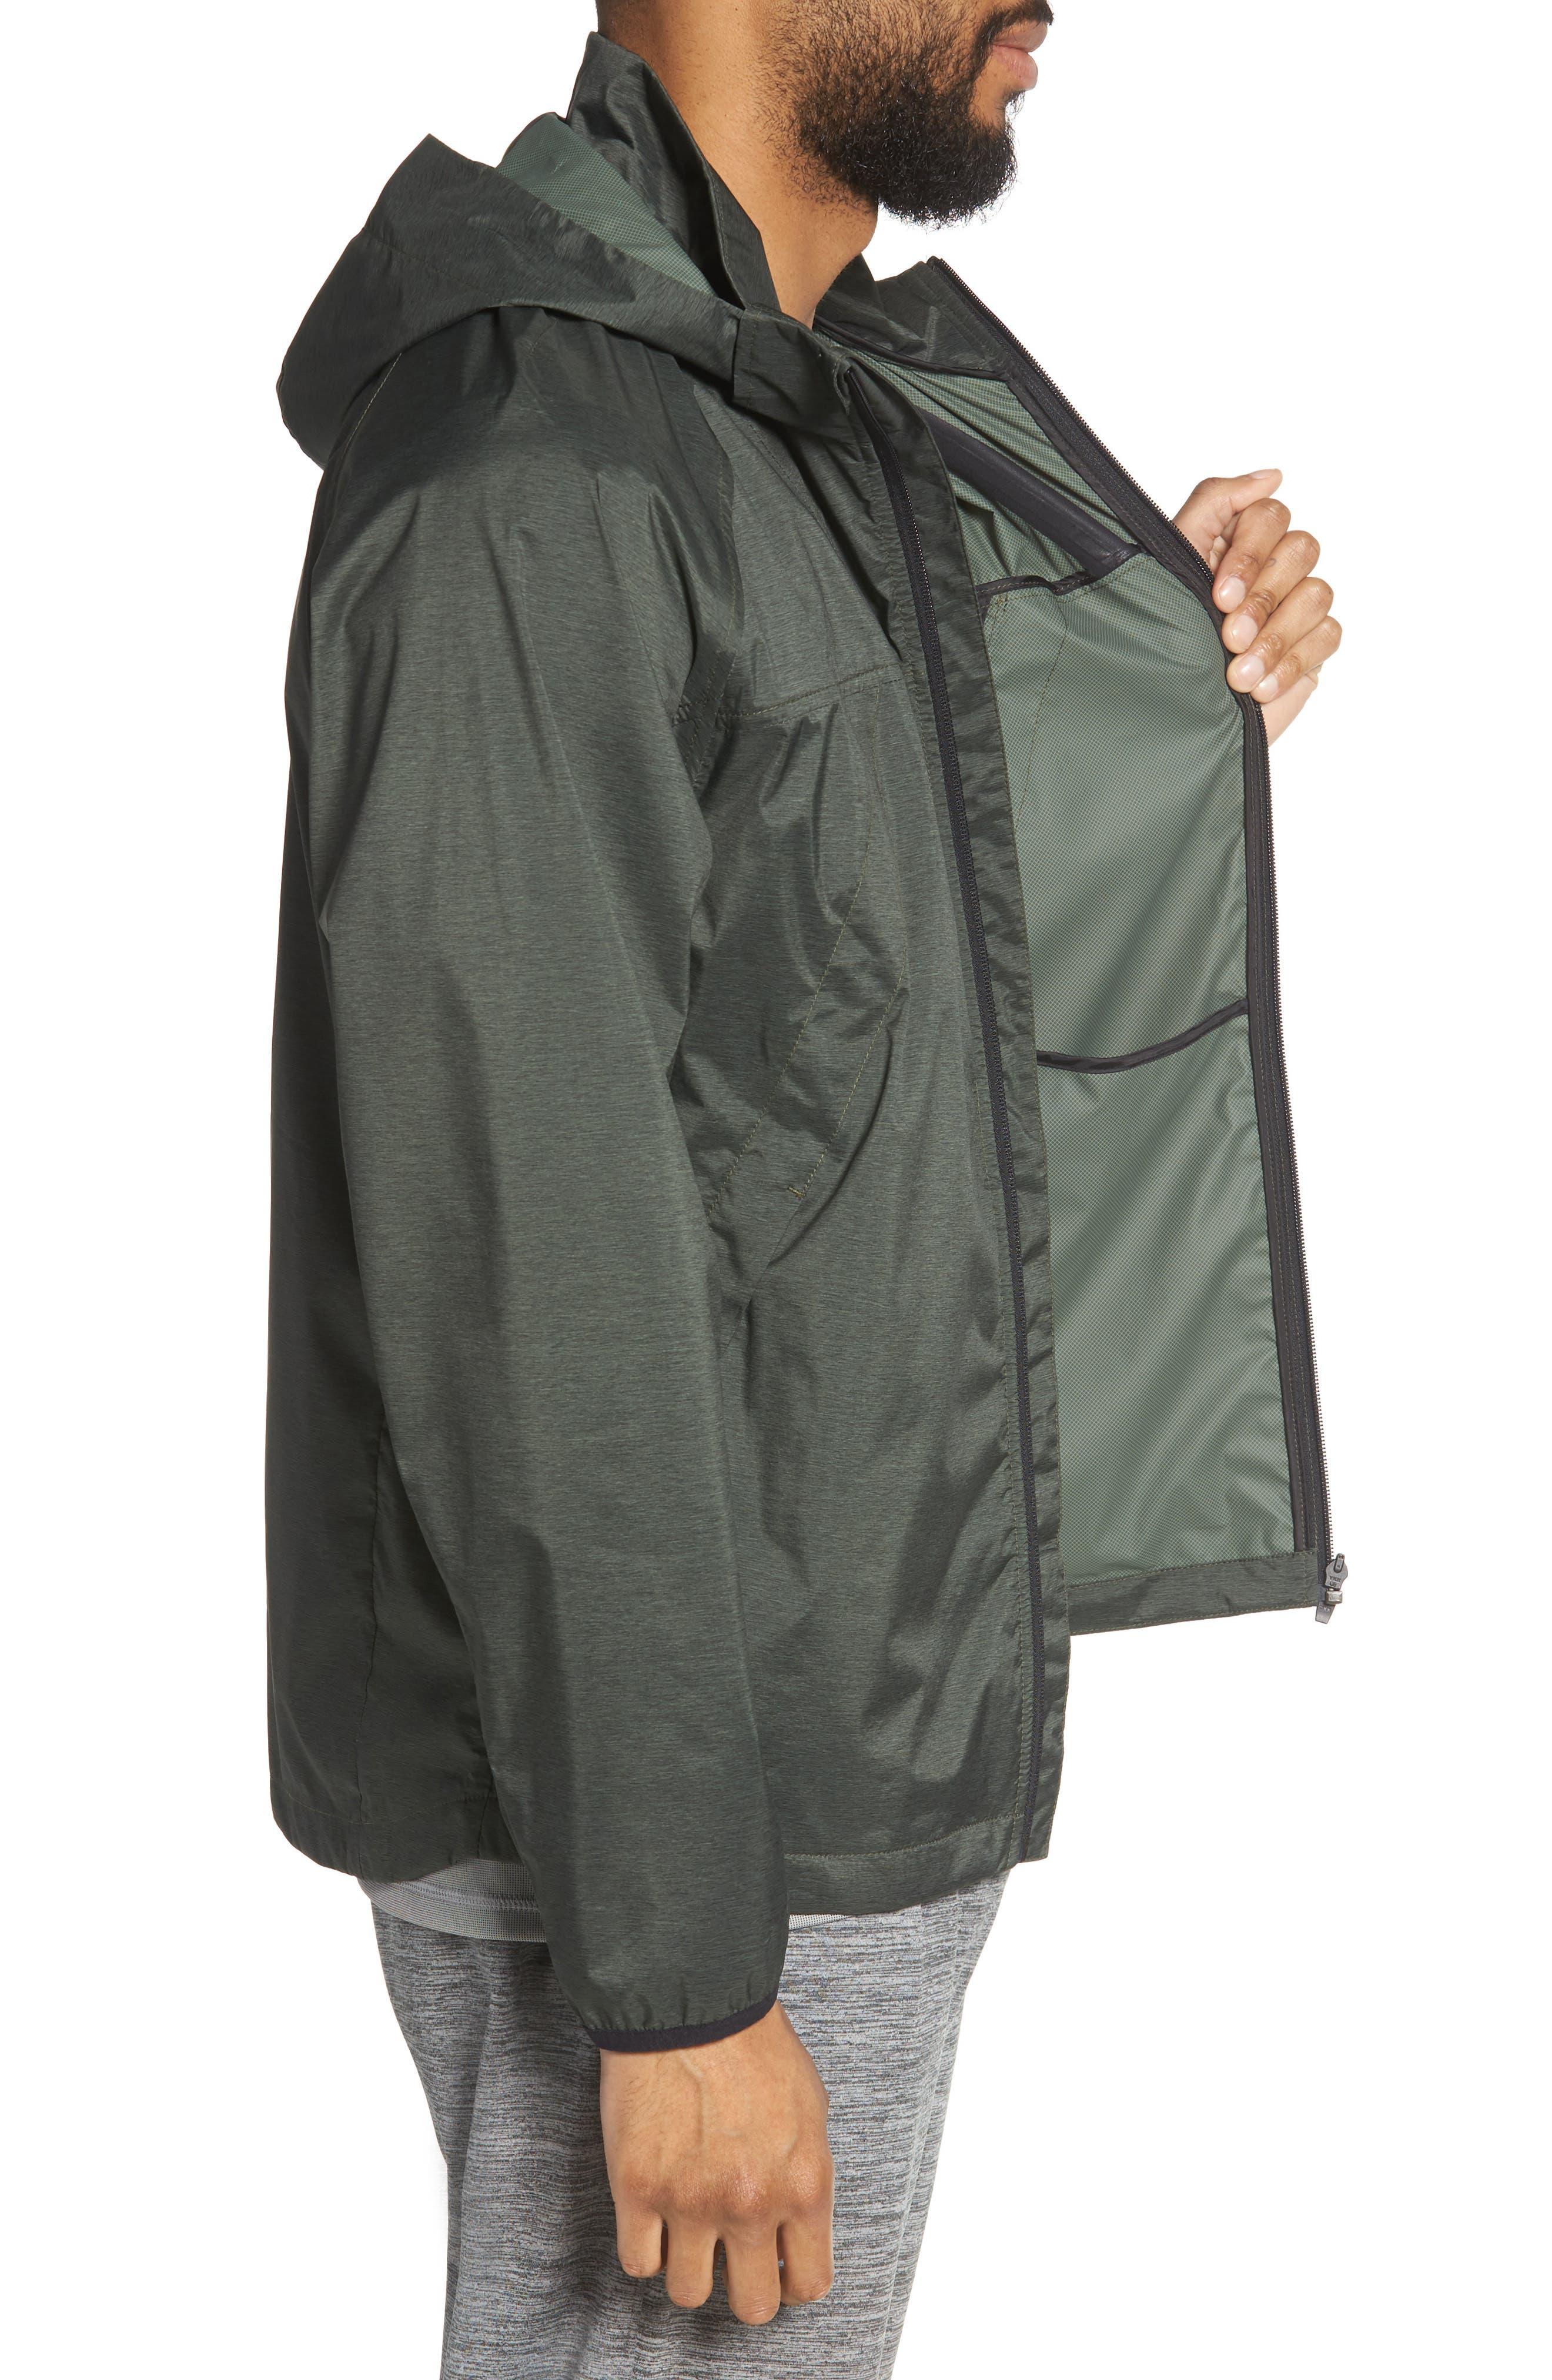 Xieite Hooded Jacket,                             Alternate thumbnail 3, color,                             GREEN TACTICAL MELANGE